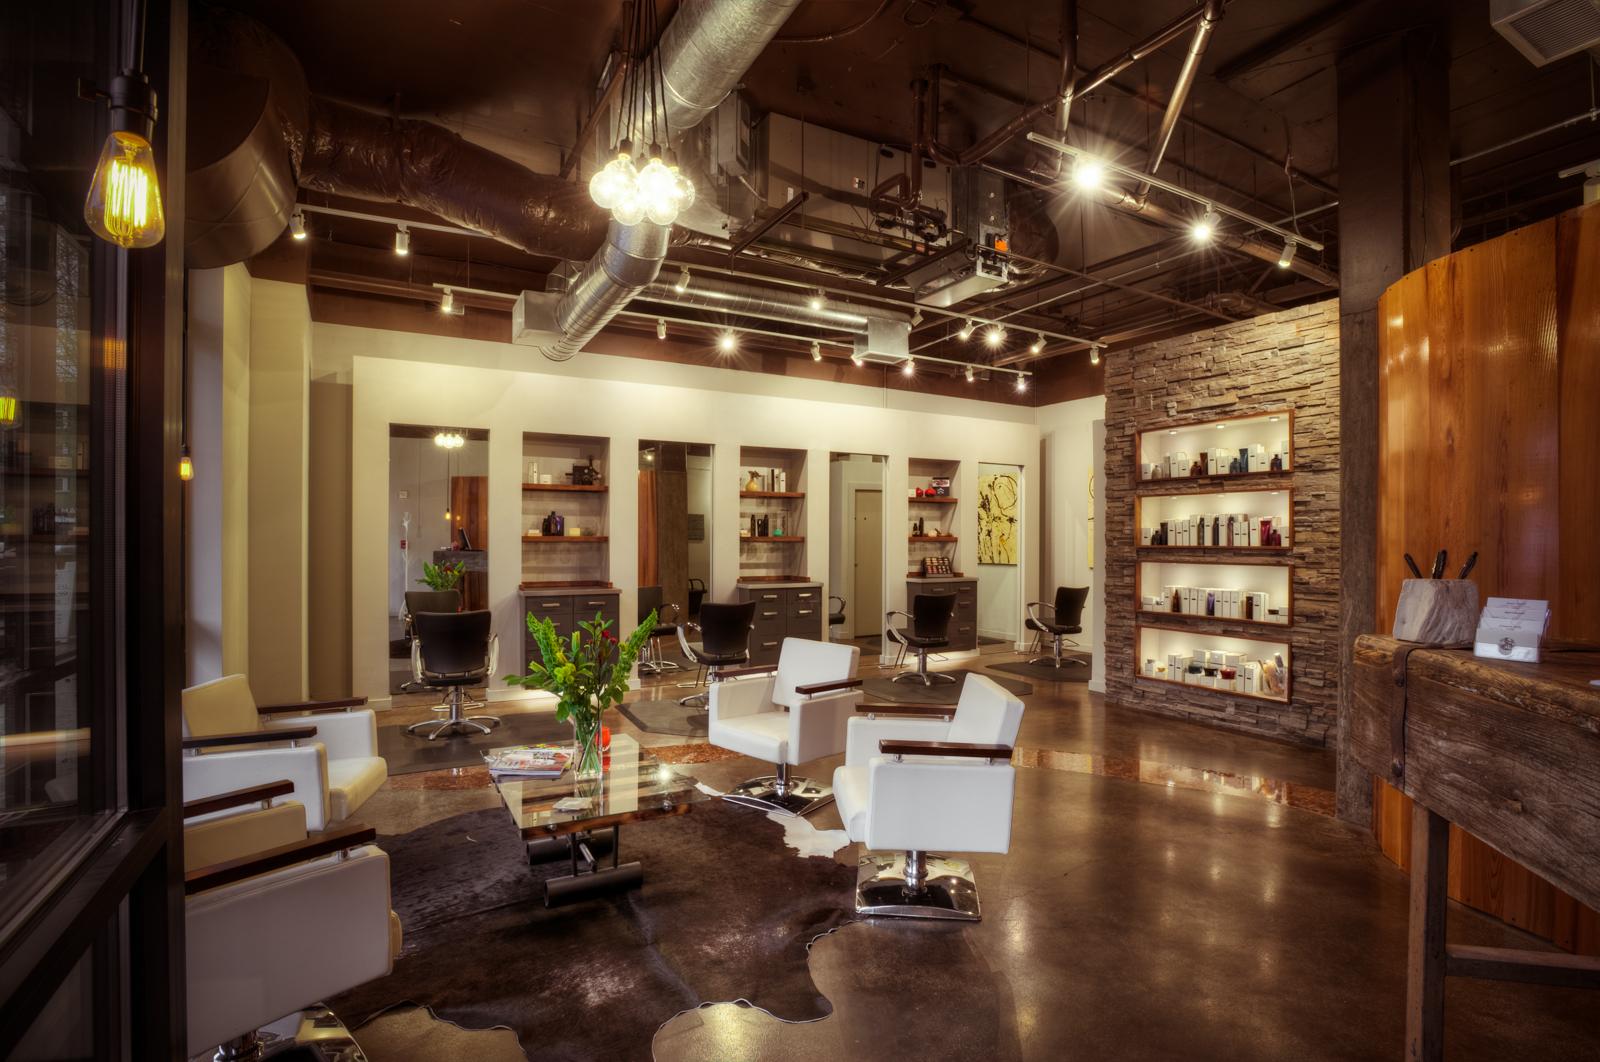 High End Hair Salon Logos Jamie-oneill-salon